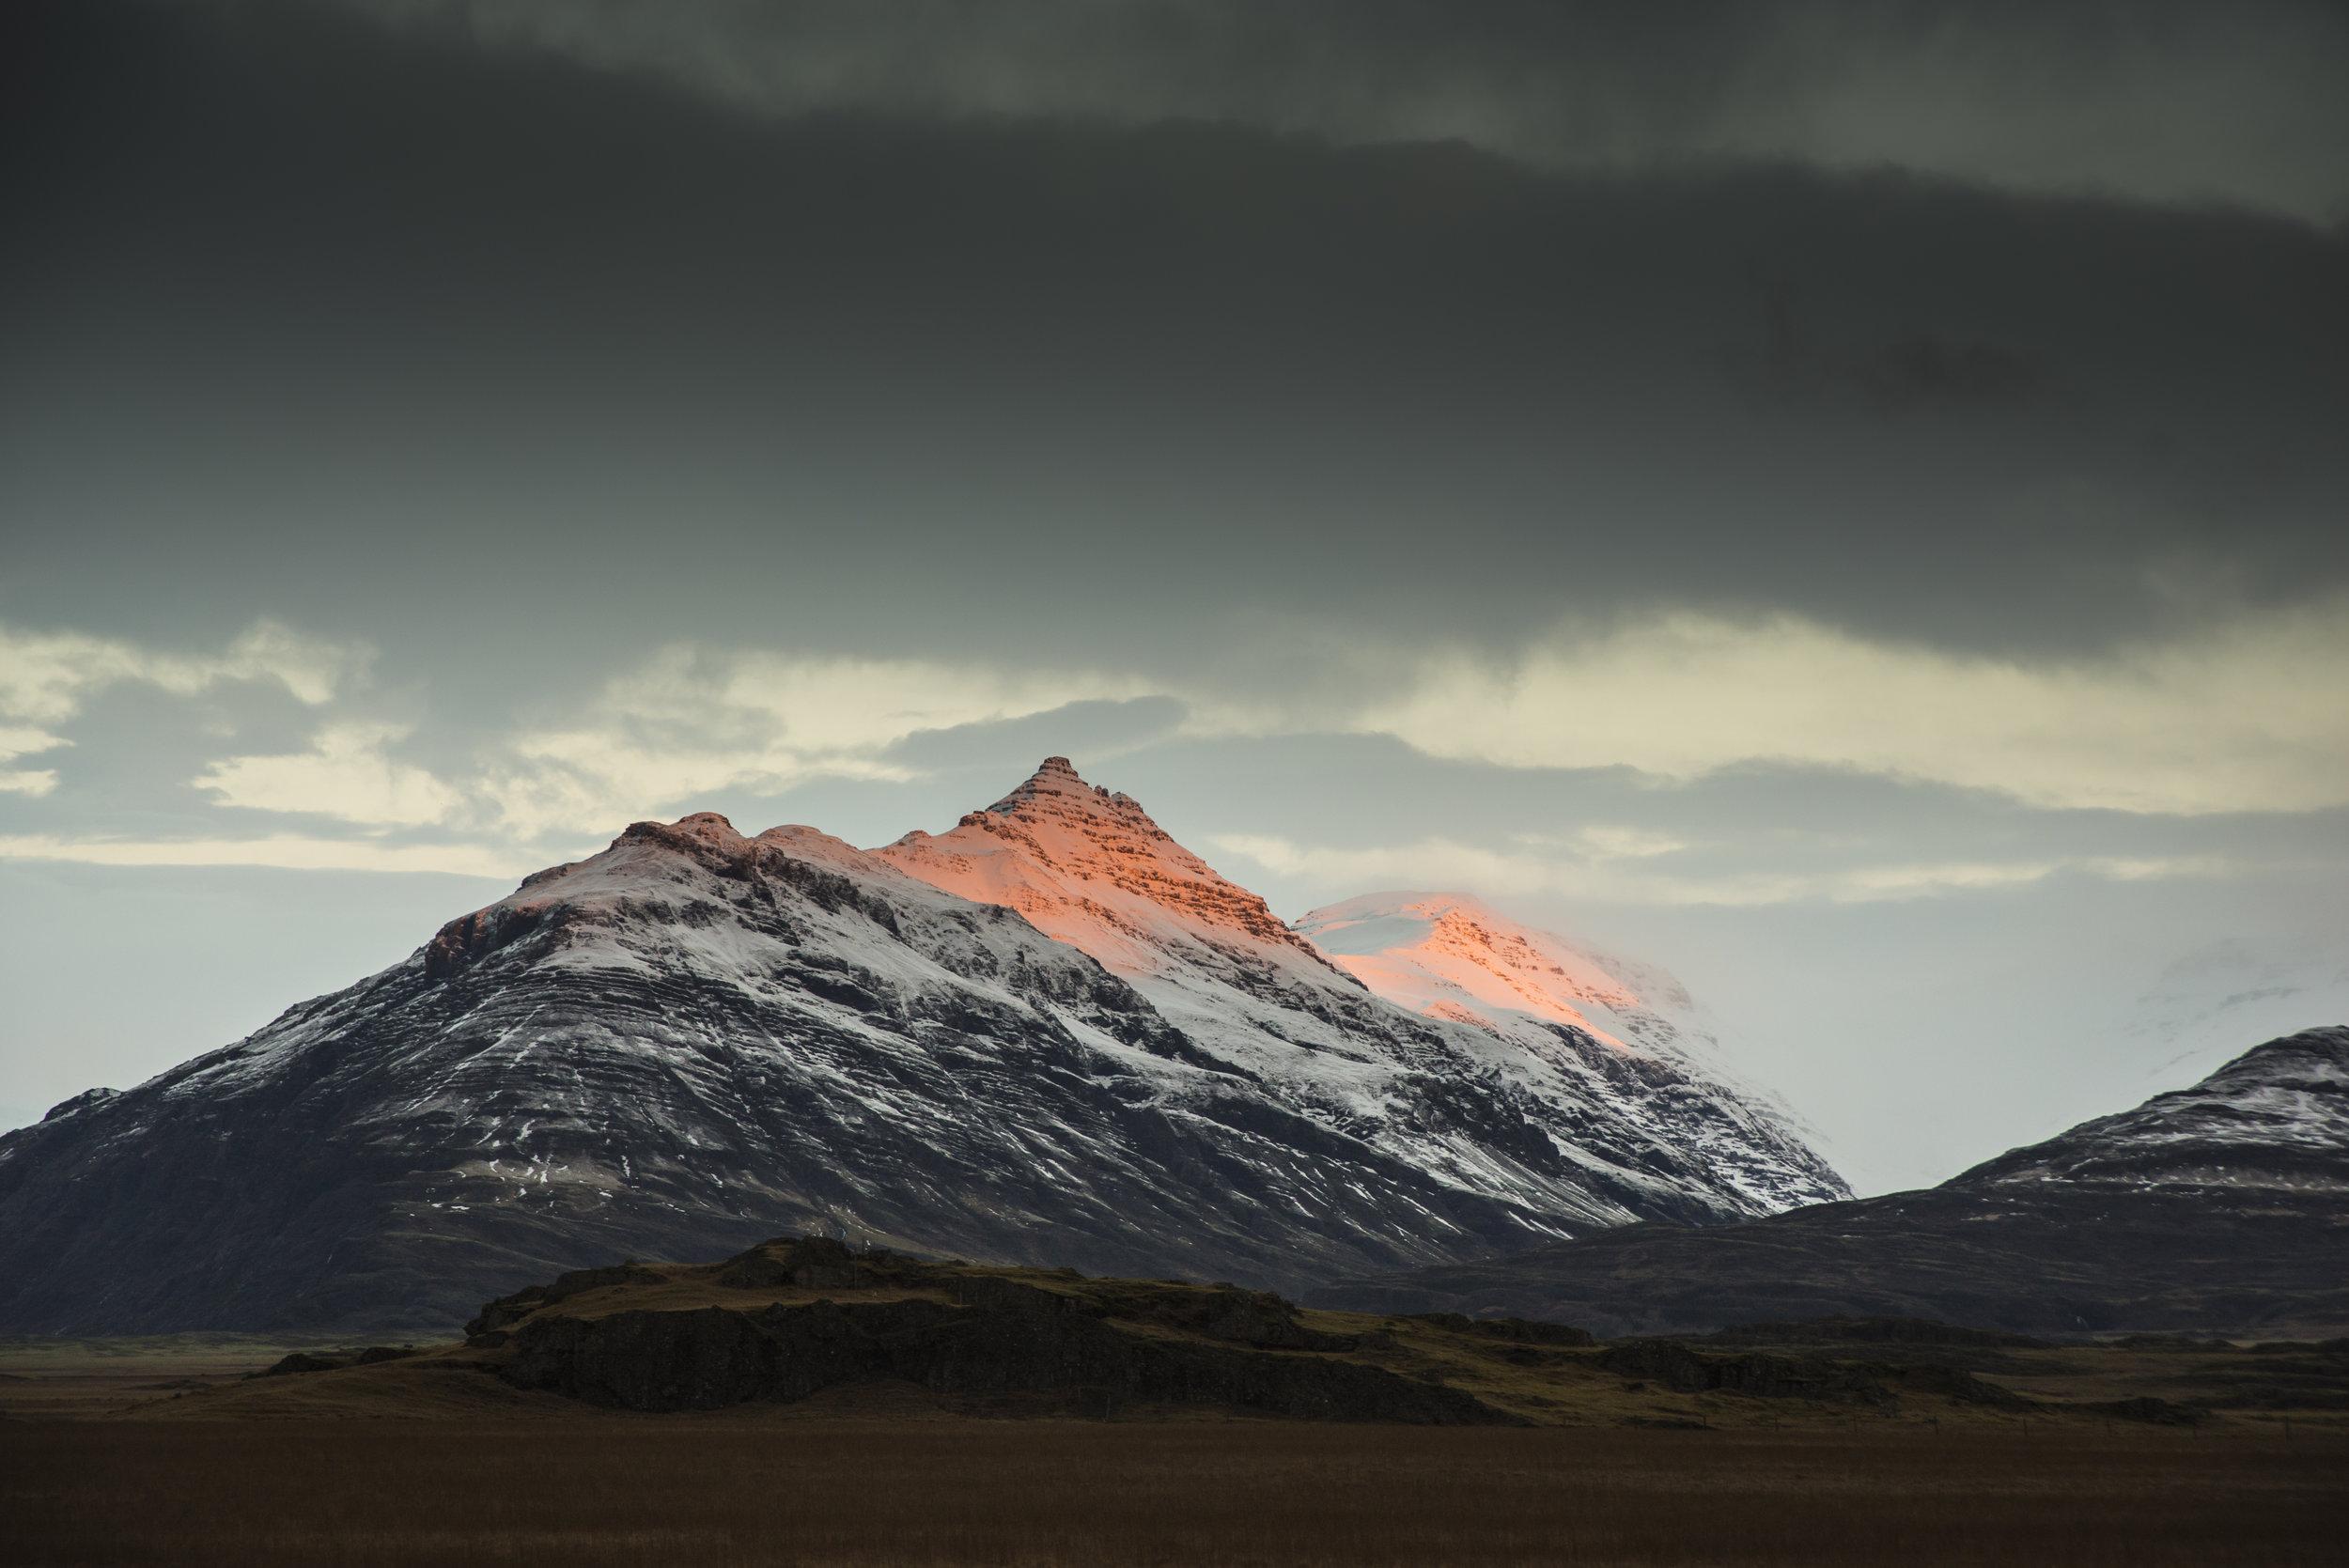 Sunrise on mountains, East Iceland